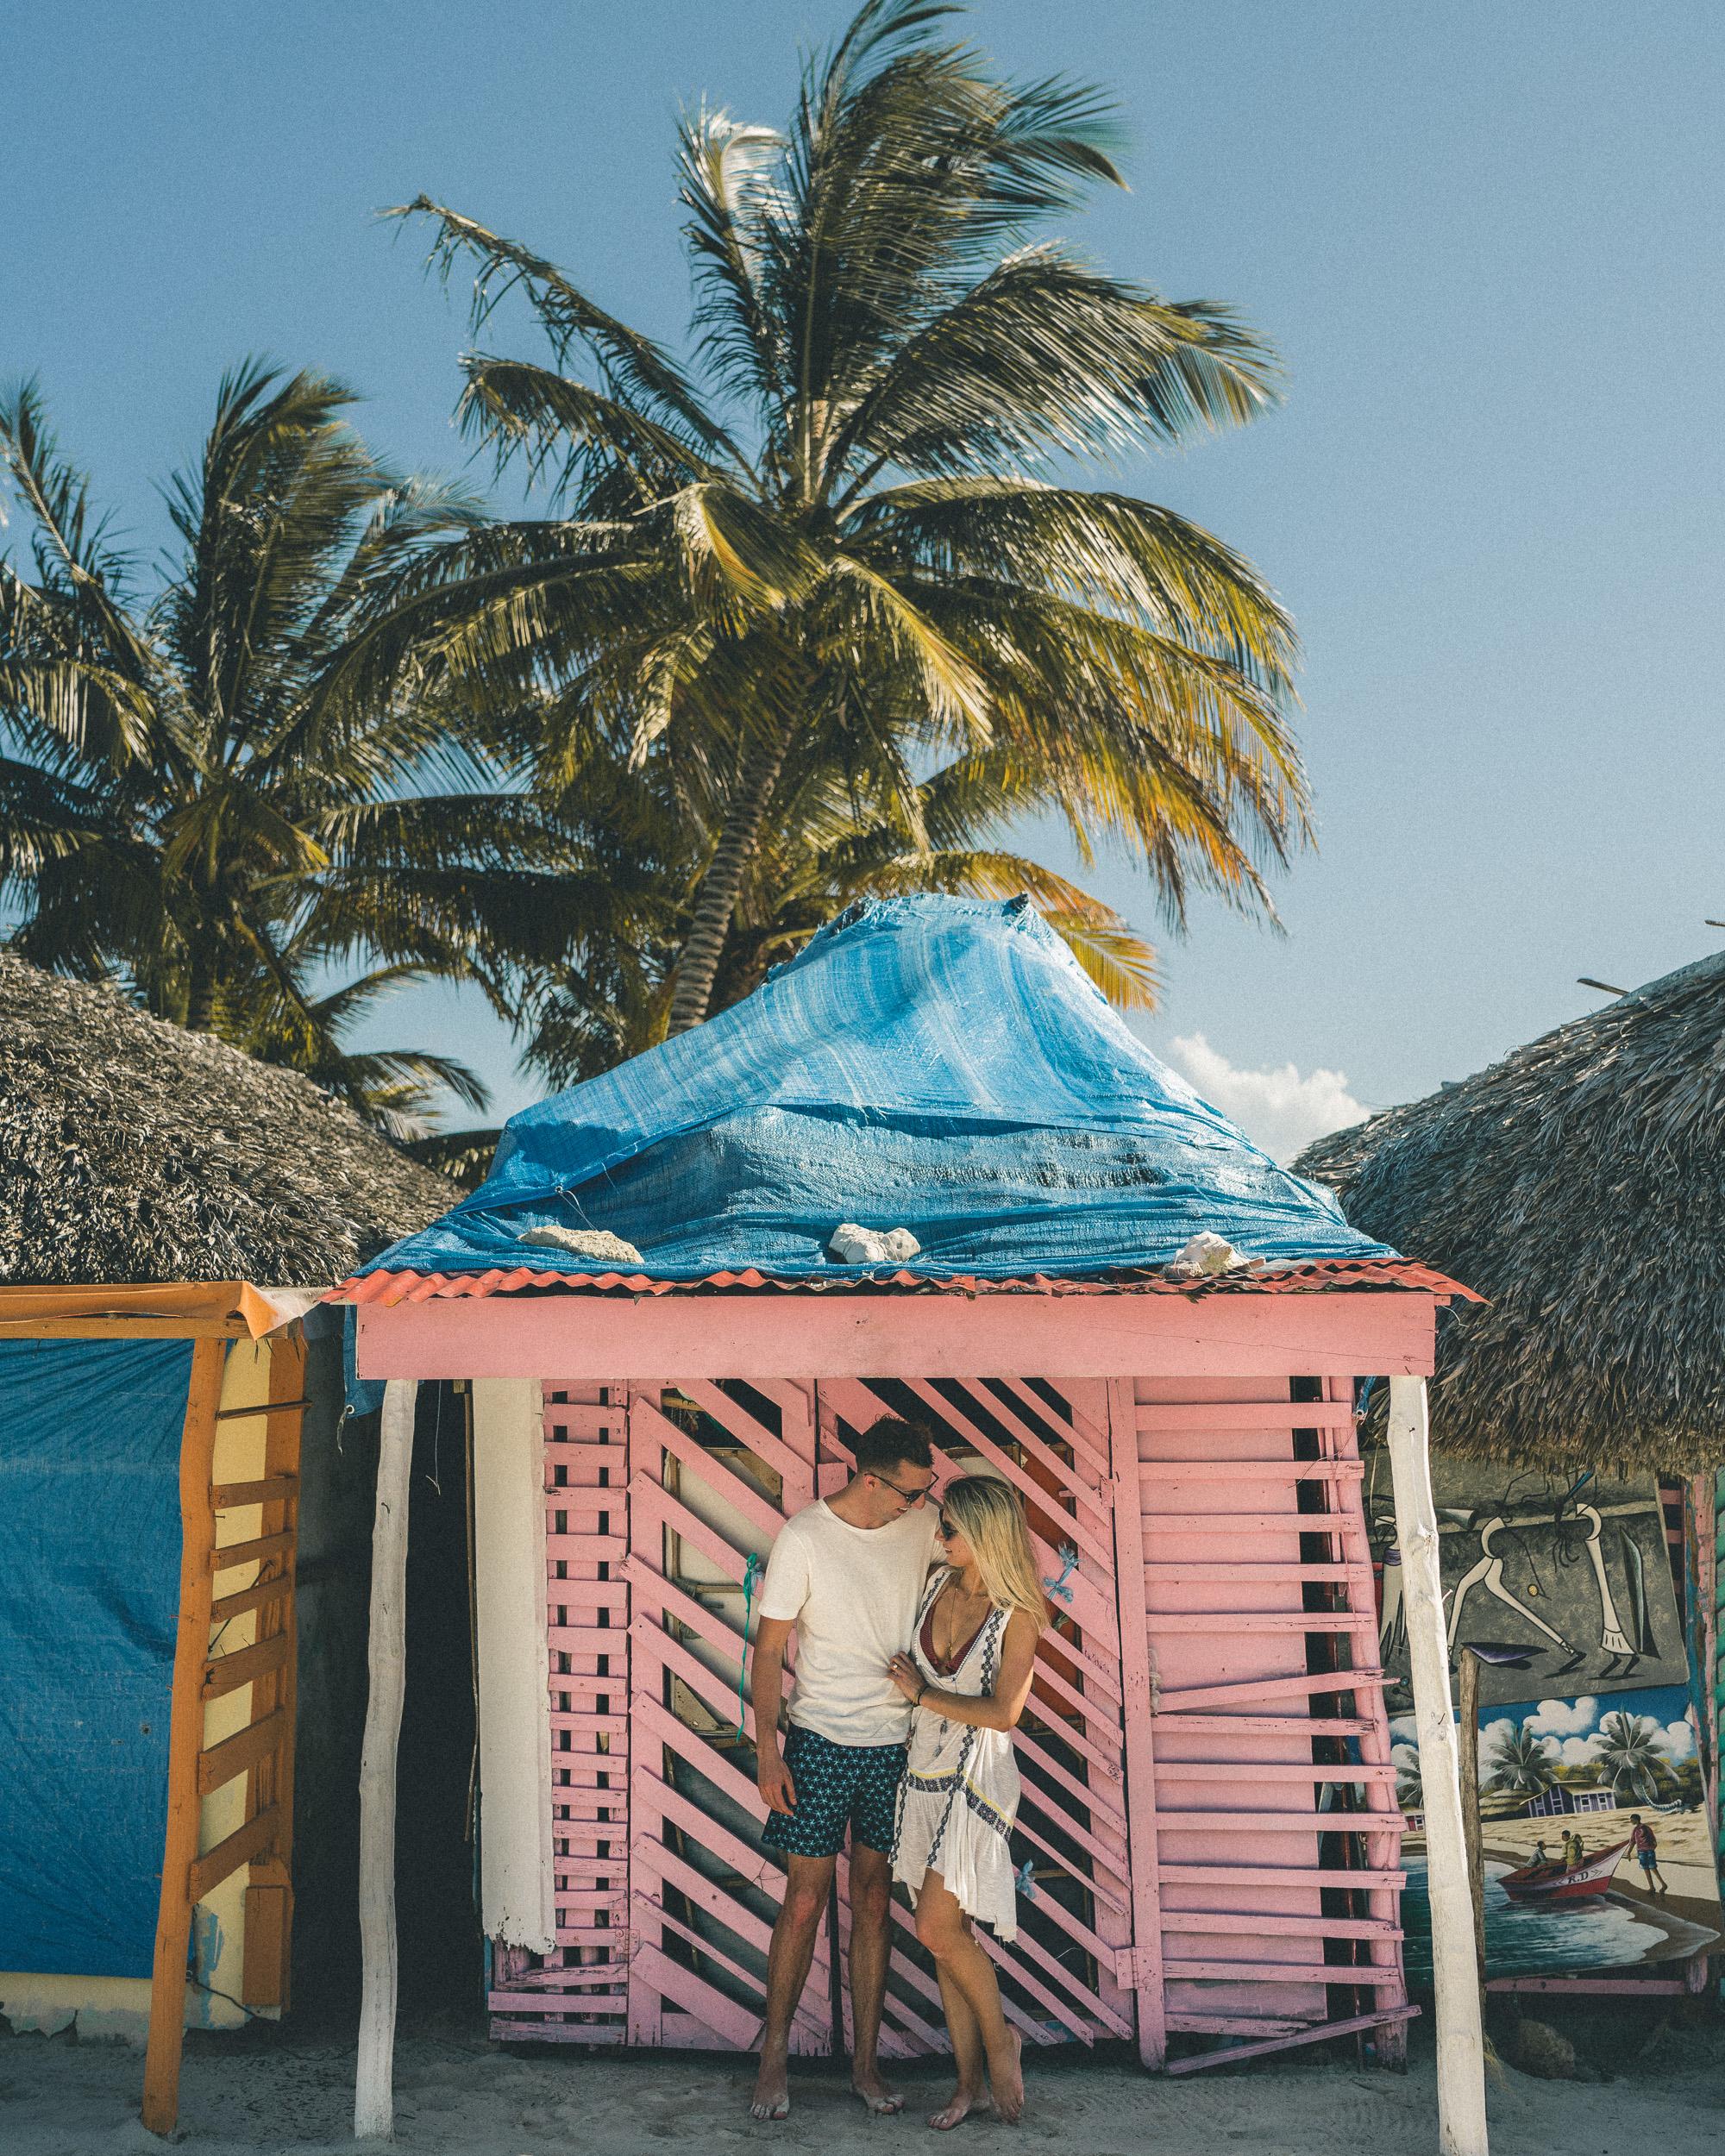 Pink beach shacks on Saona Island, Dominican Republic | Clear Blue Water in Punta Cana | Tropical Paradise Beach Getaways in the Caribbean | Islands Near North America